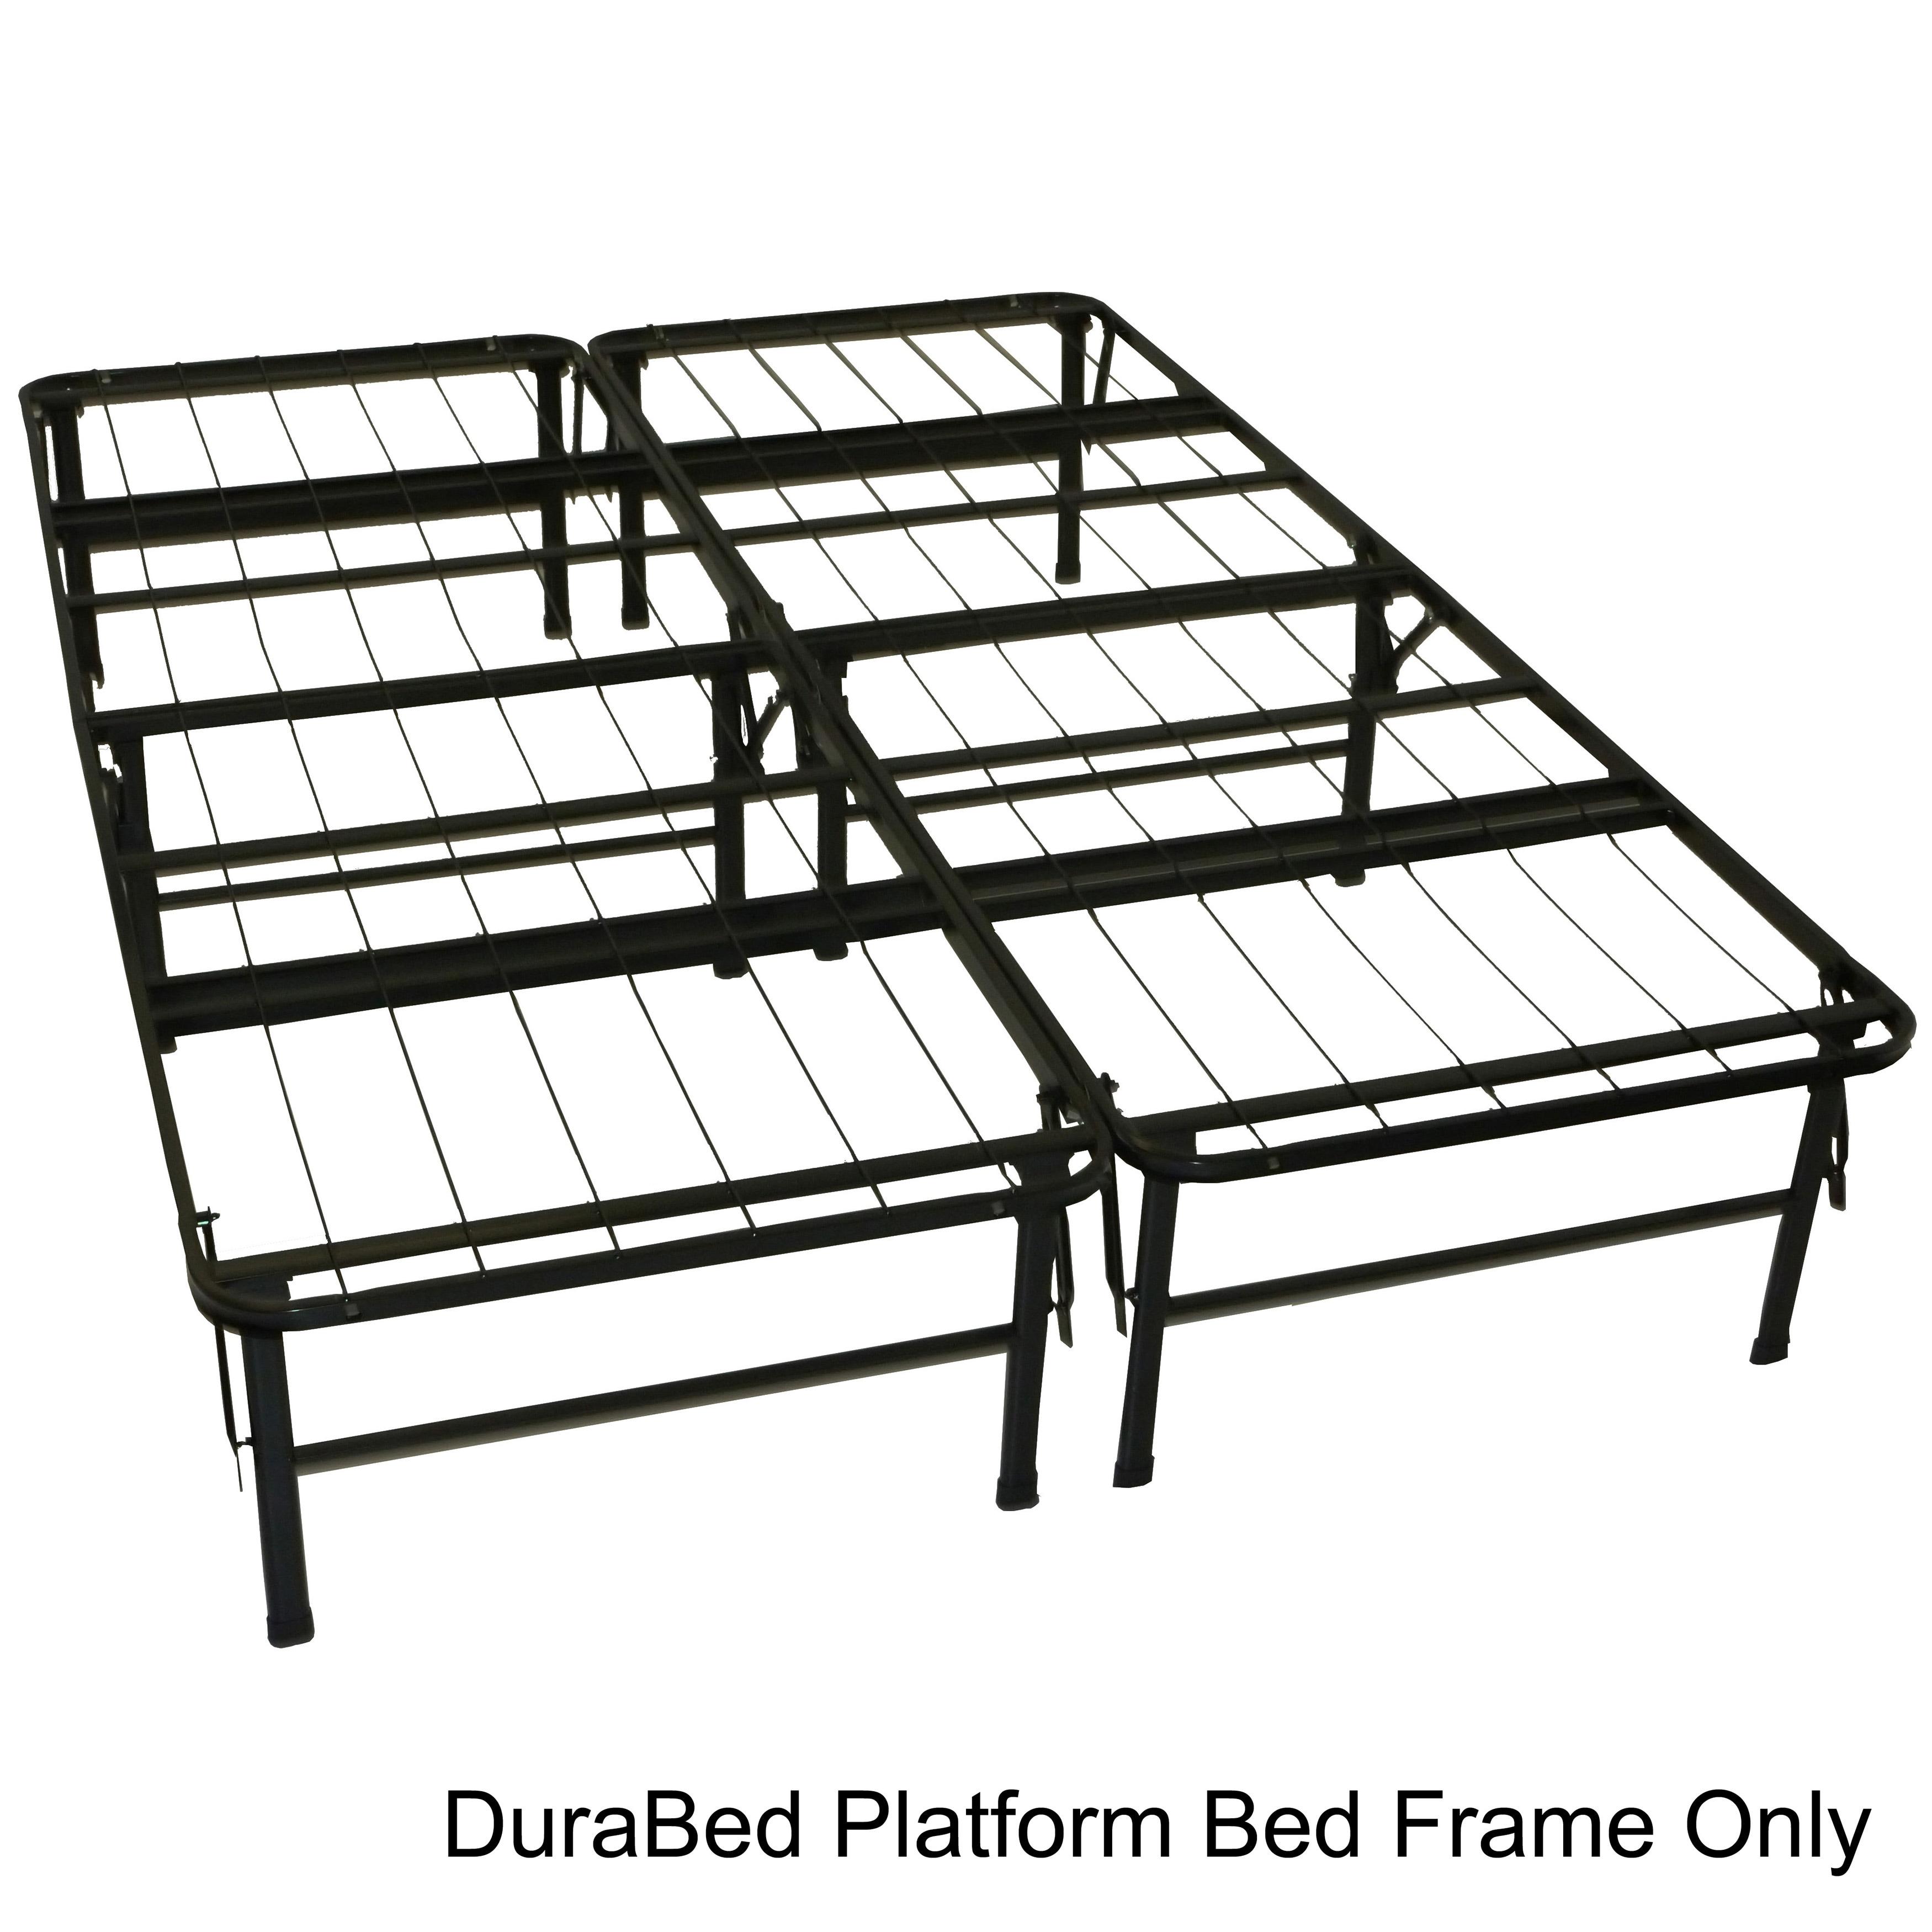 Heavy Duty A Frame : Durabed full size heavy duty steel foundation frame in